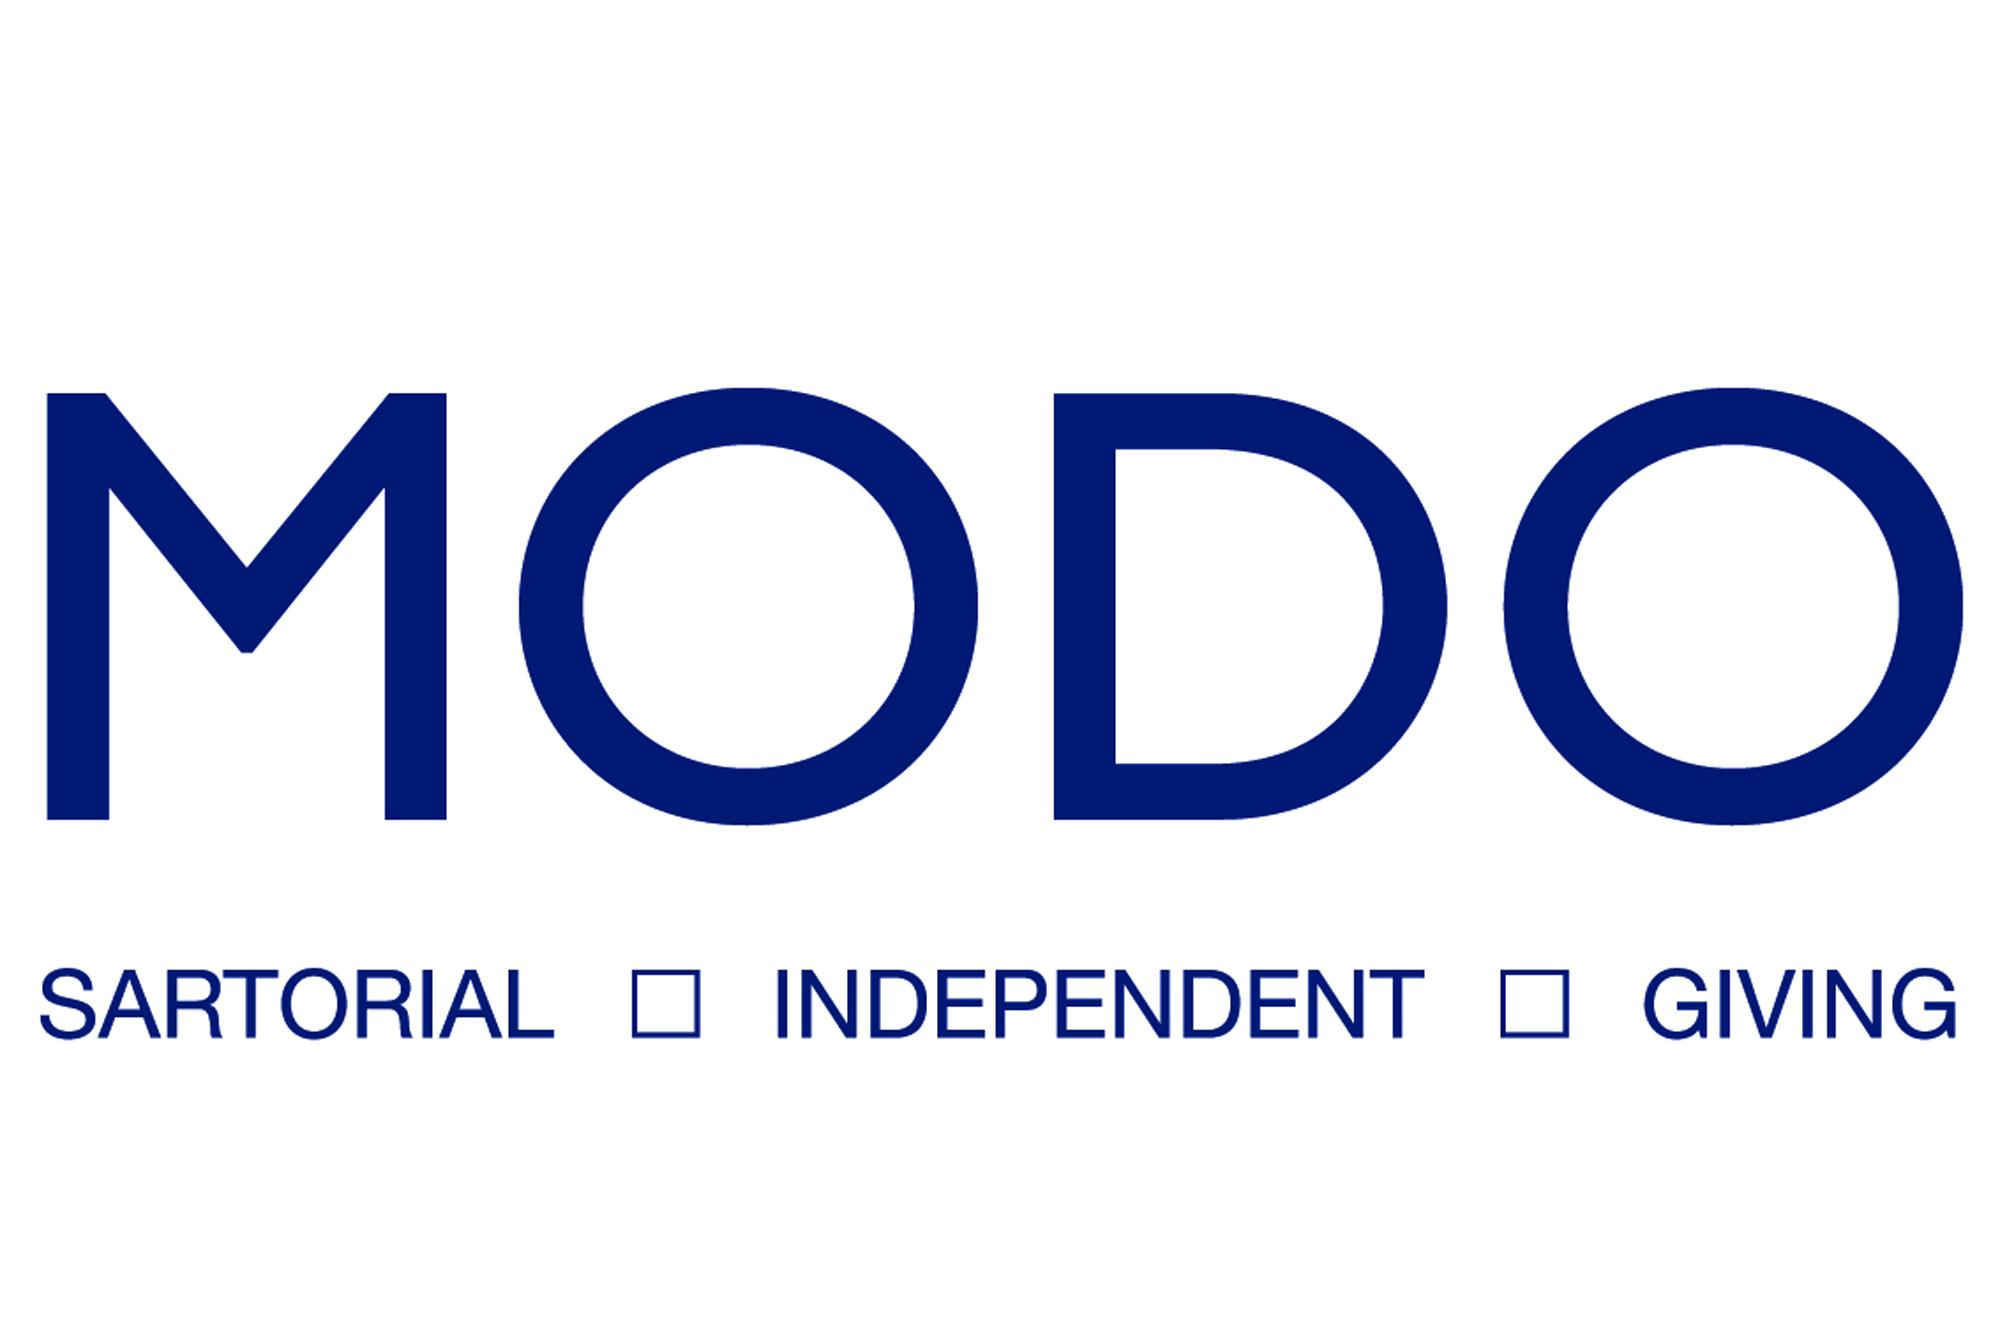 Modo - Stendhal DKRED